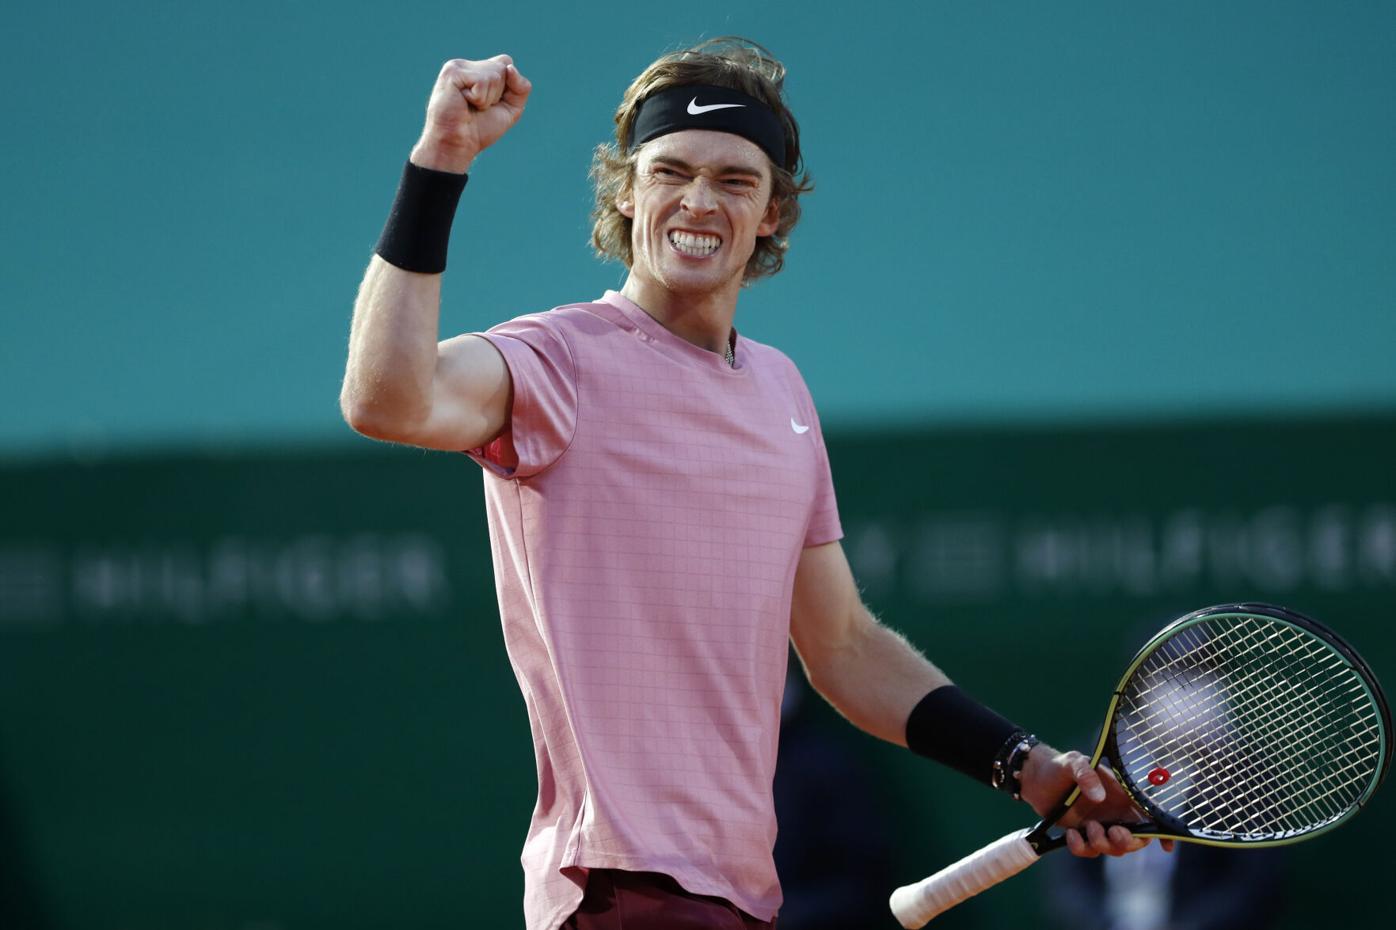 Monte-Carlo Masters 2021: Stefanos Tsitsipas vs. Andrey Rublev Tennis Pick and Prediction